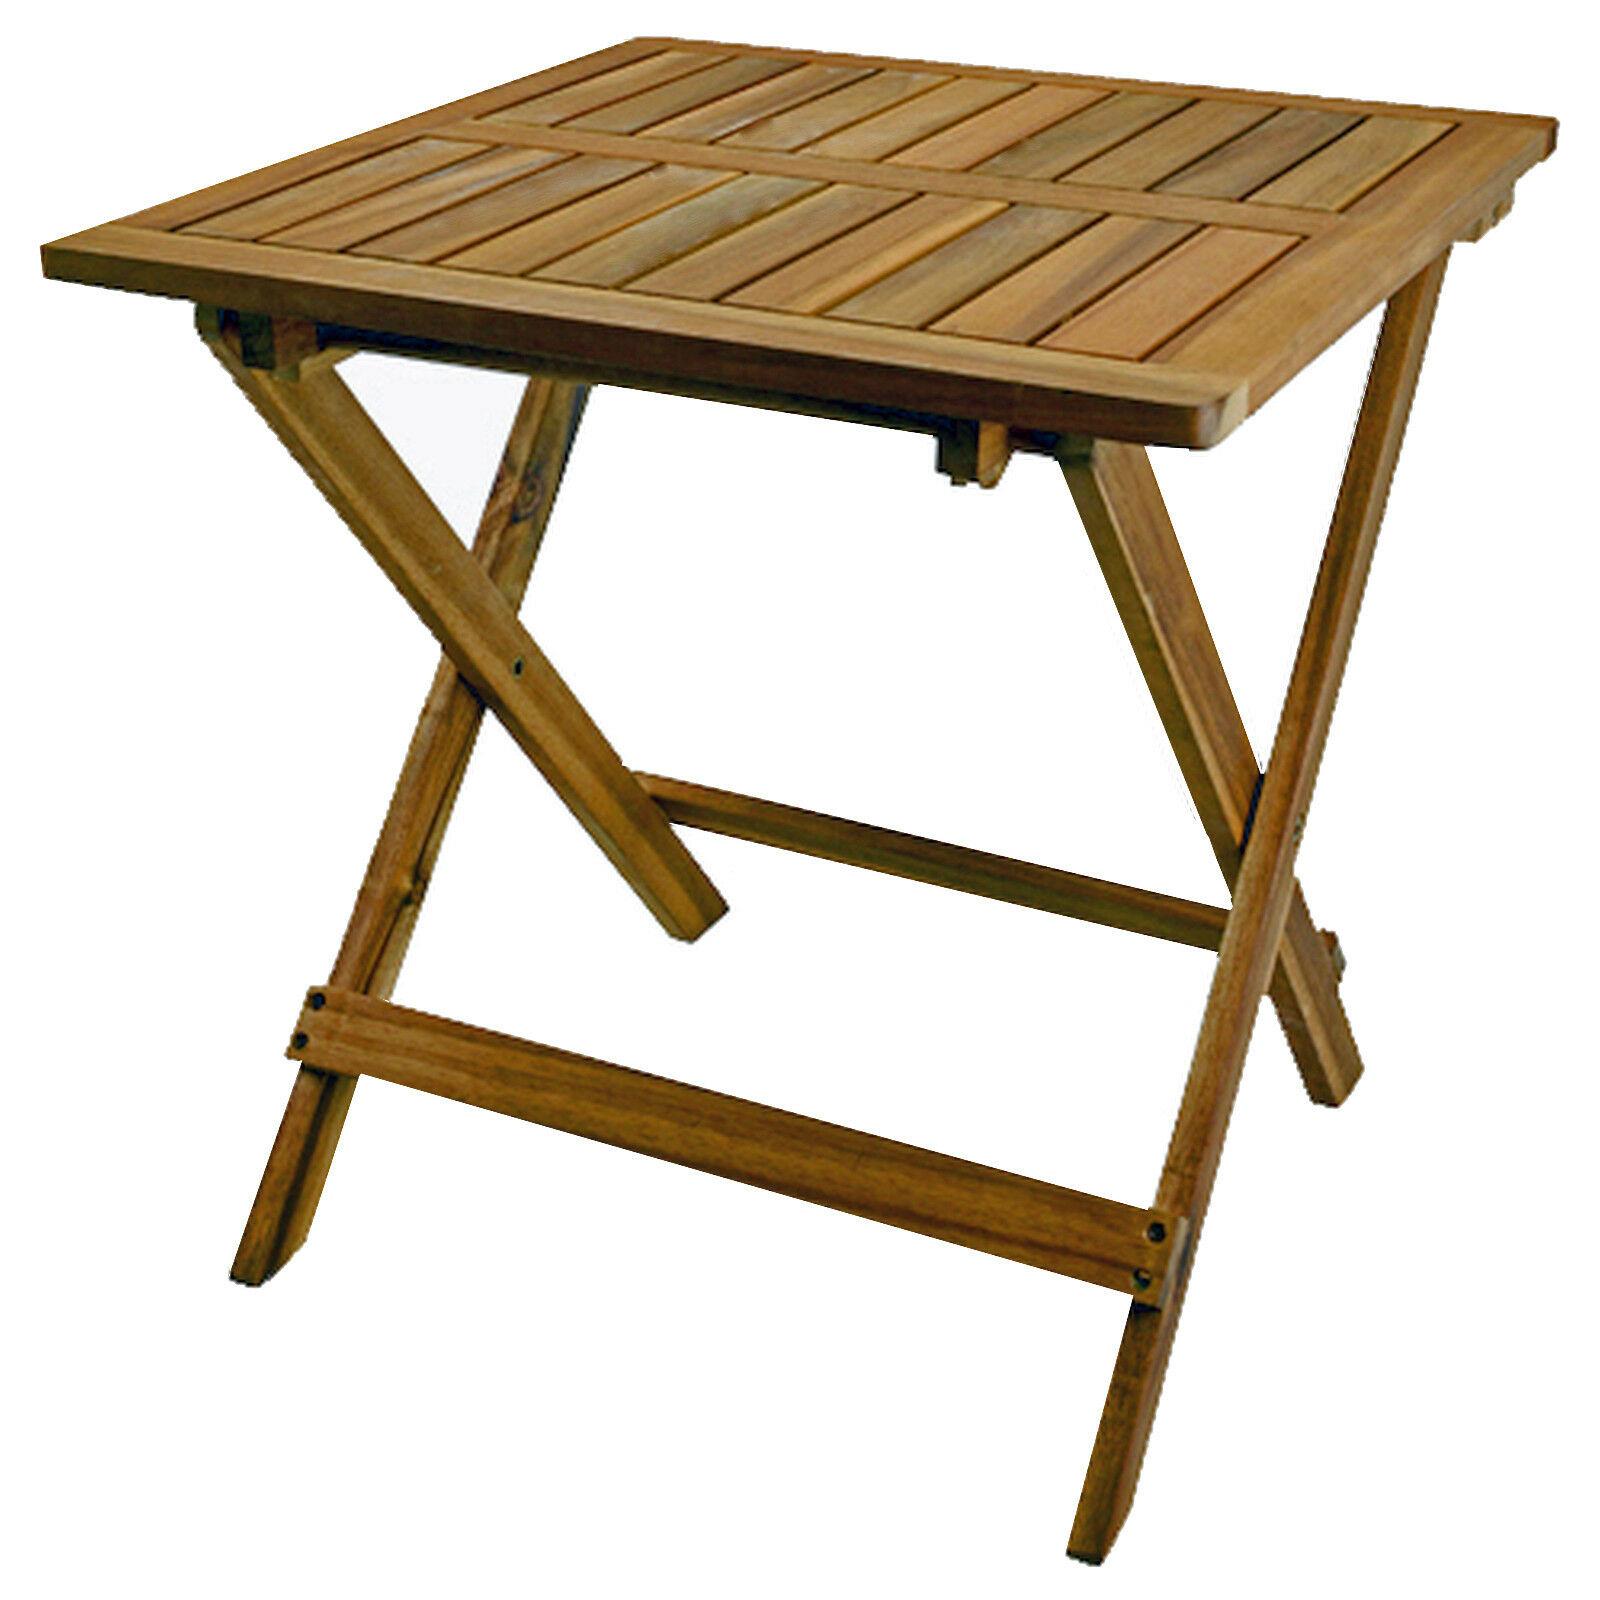 Full Size of Balkontisch Holz Klappbar Gartentisch Campingtisch Beistelltisch Bett Ausklappbar Ausklappbares Wohnzimmer Balkontisch Klappbar